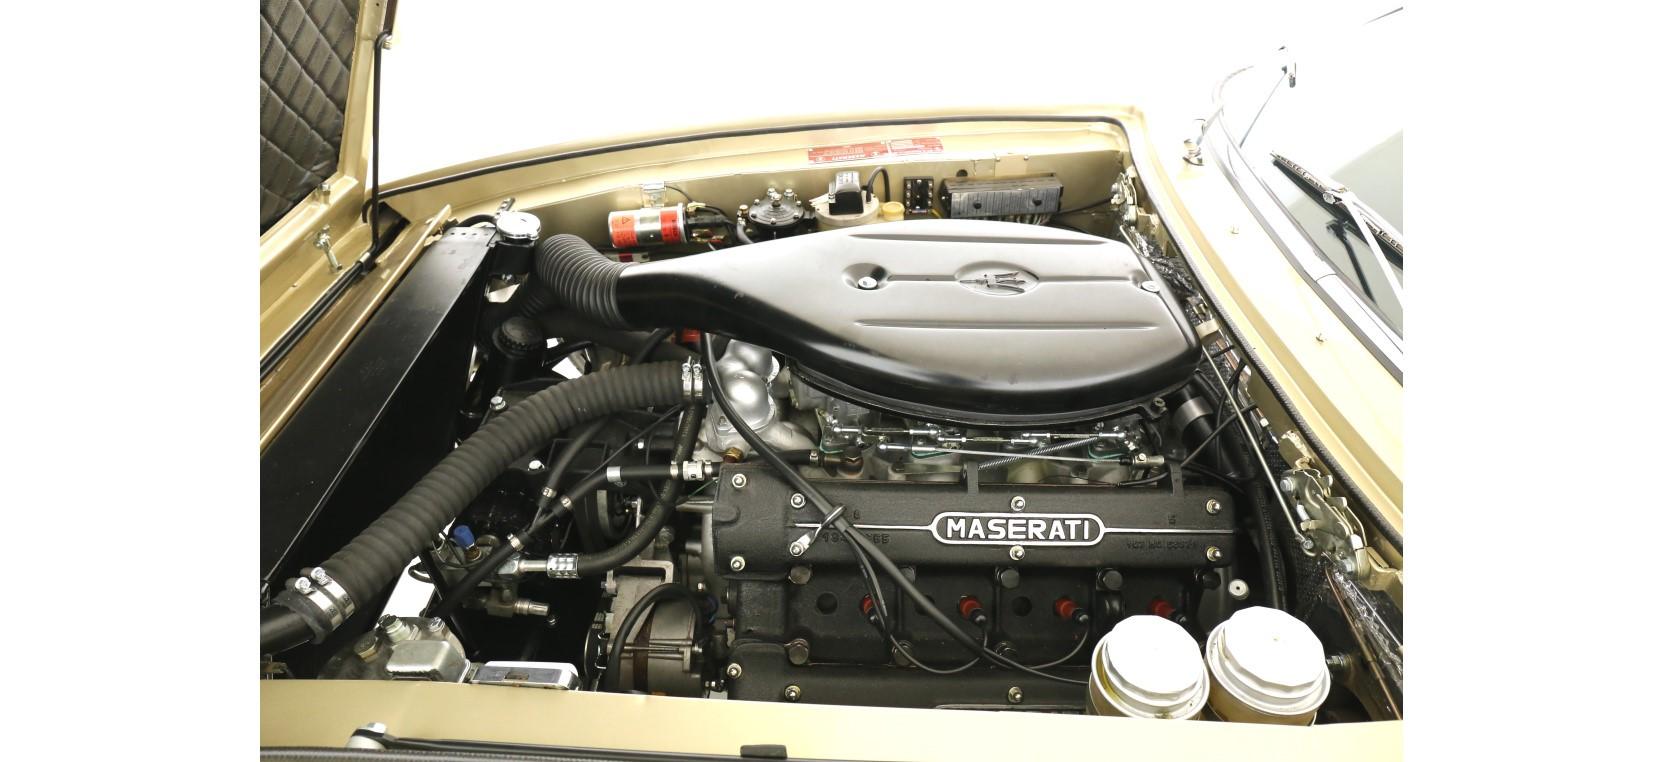 Maserati Ghibli 8